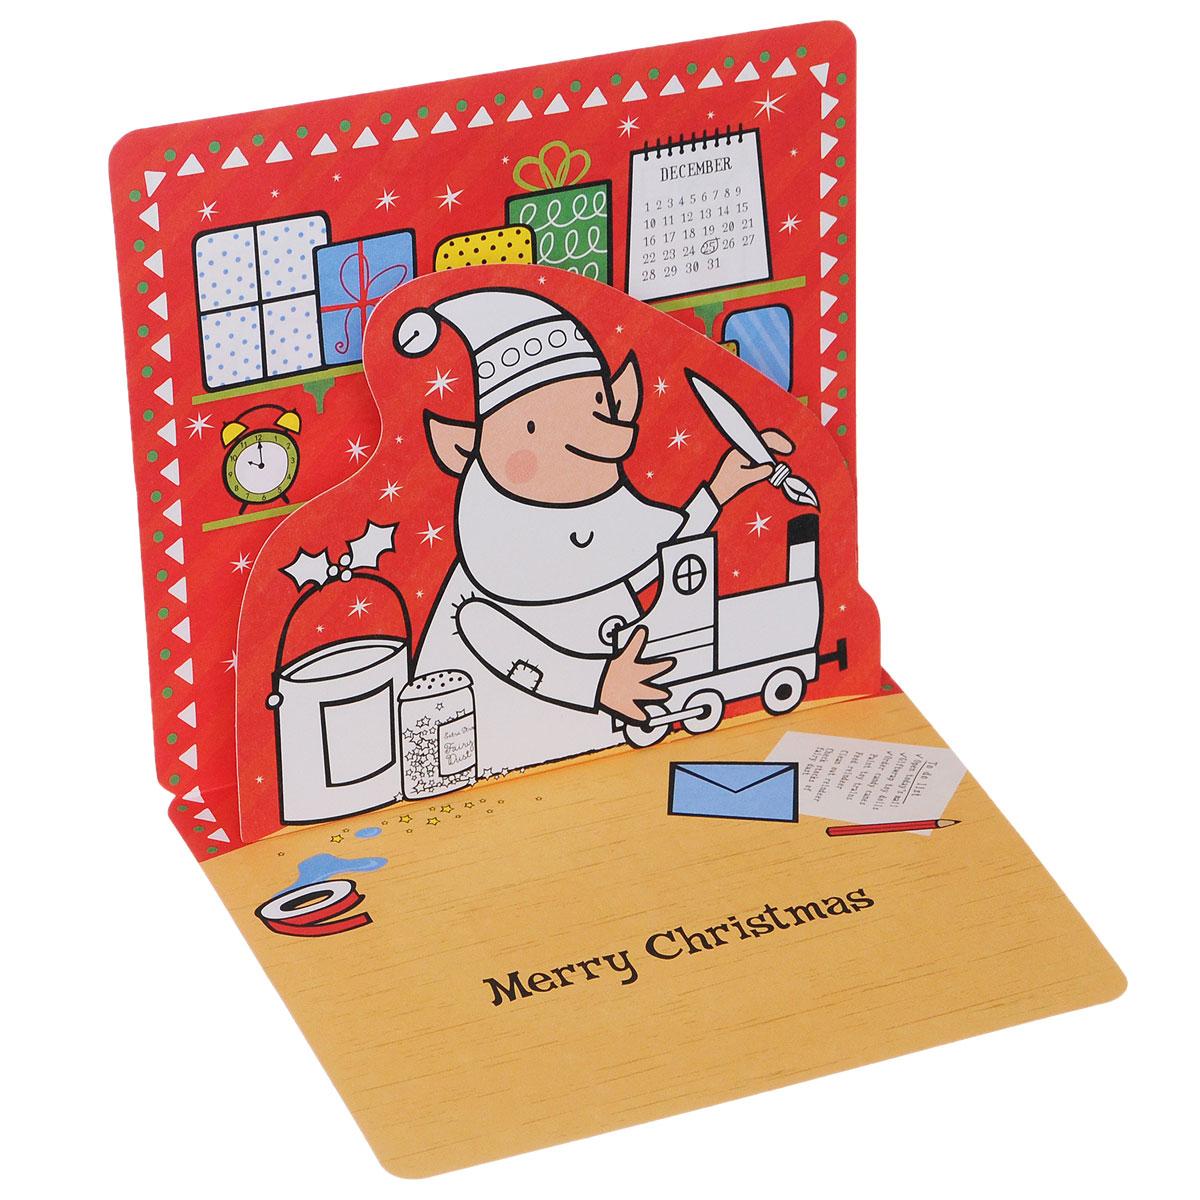 20 Pop-up Christmas Cards to Colour (набор из 20 открыток с конвертами)